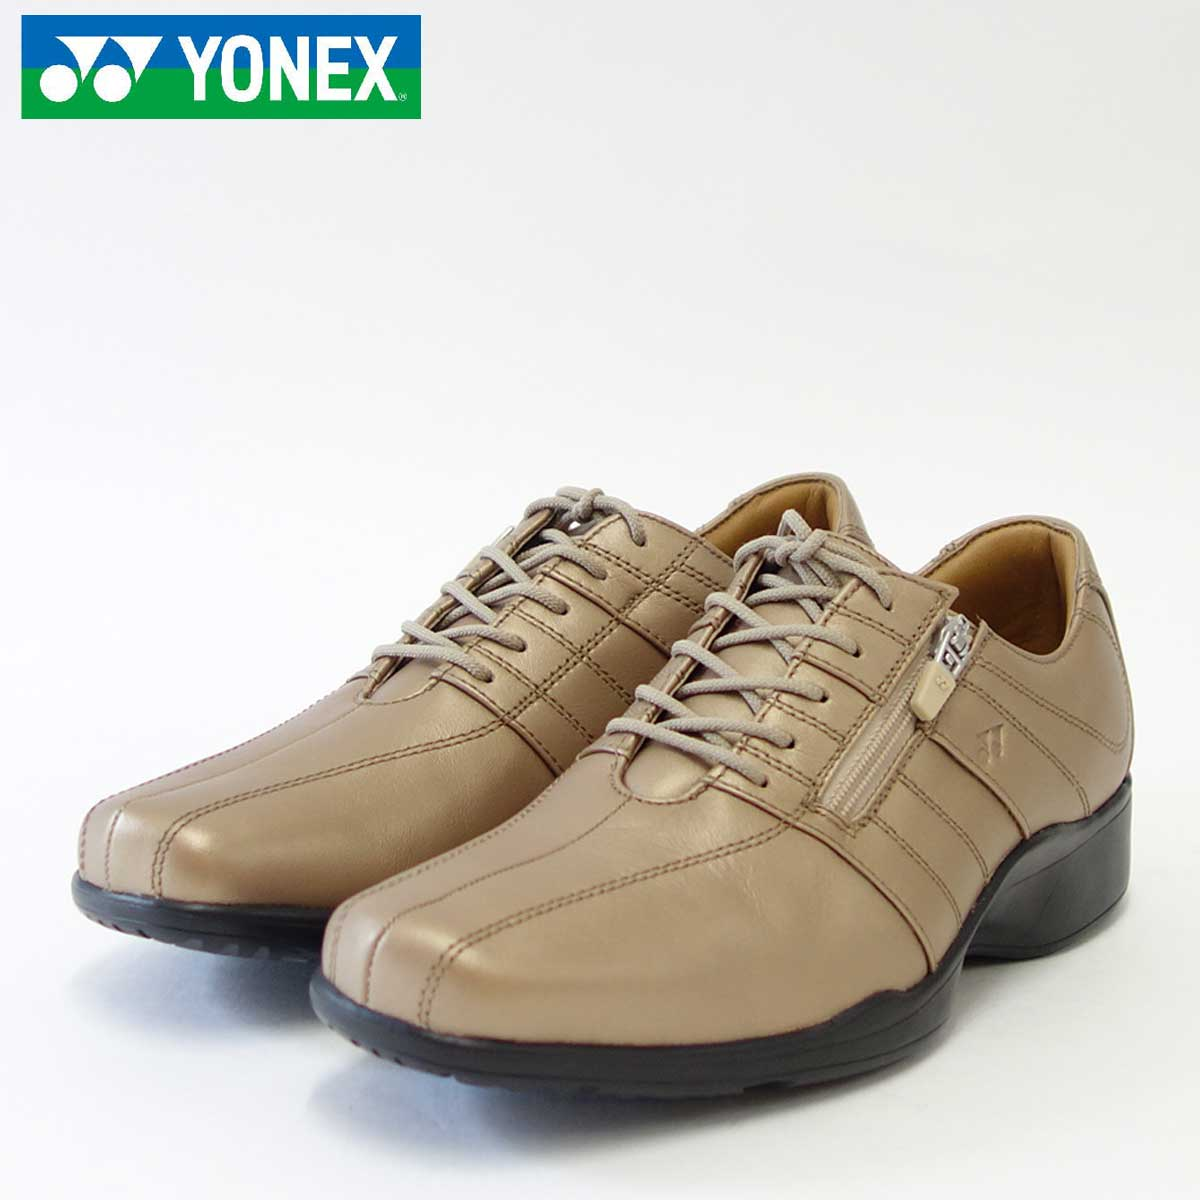 YONEX ヨネックス LT01N パールベージュ(レディース)旅ウォーク 軽い疲れにくいウォーキングシューズ「靴」